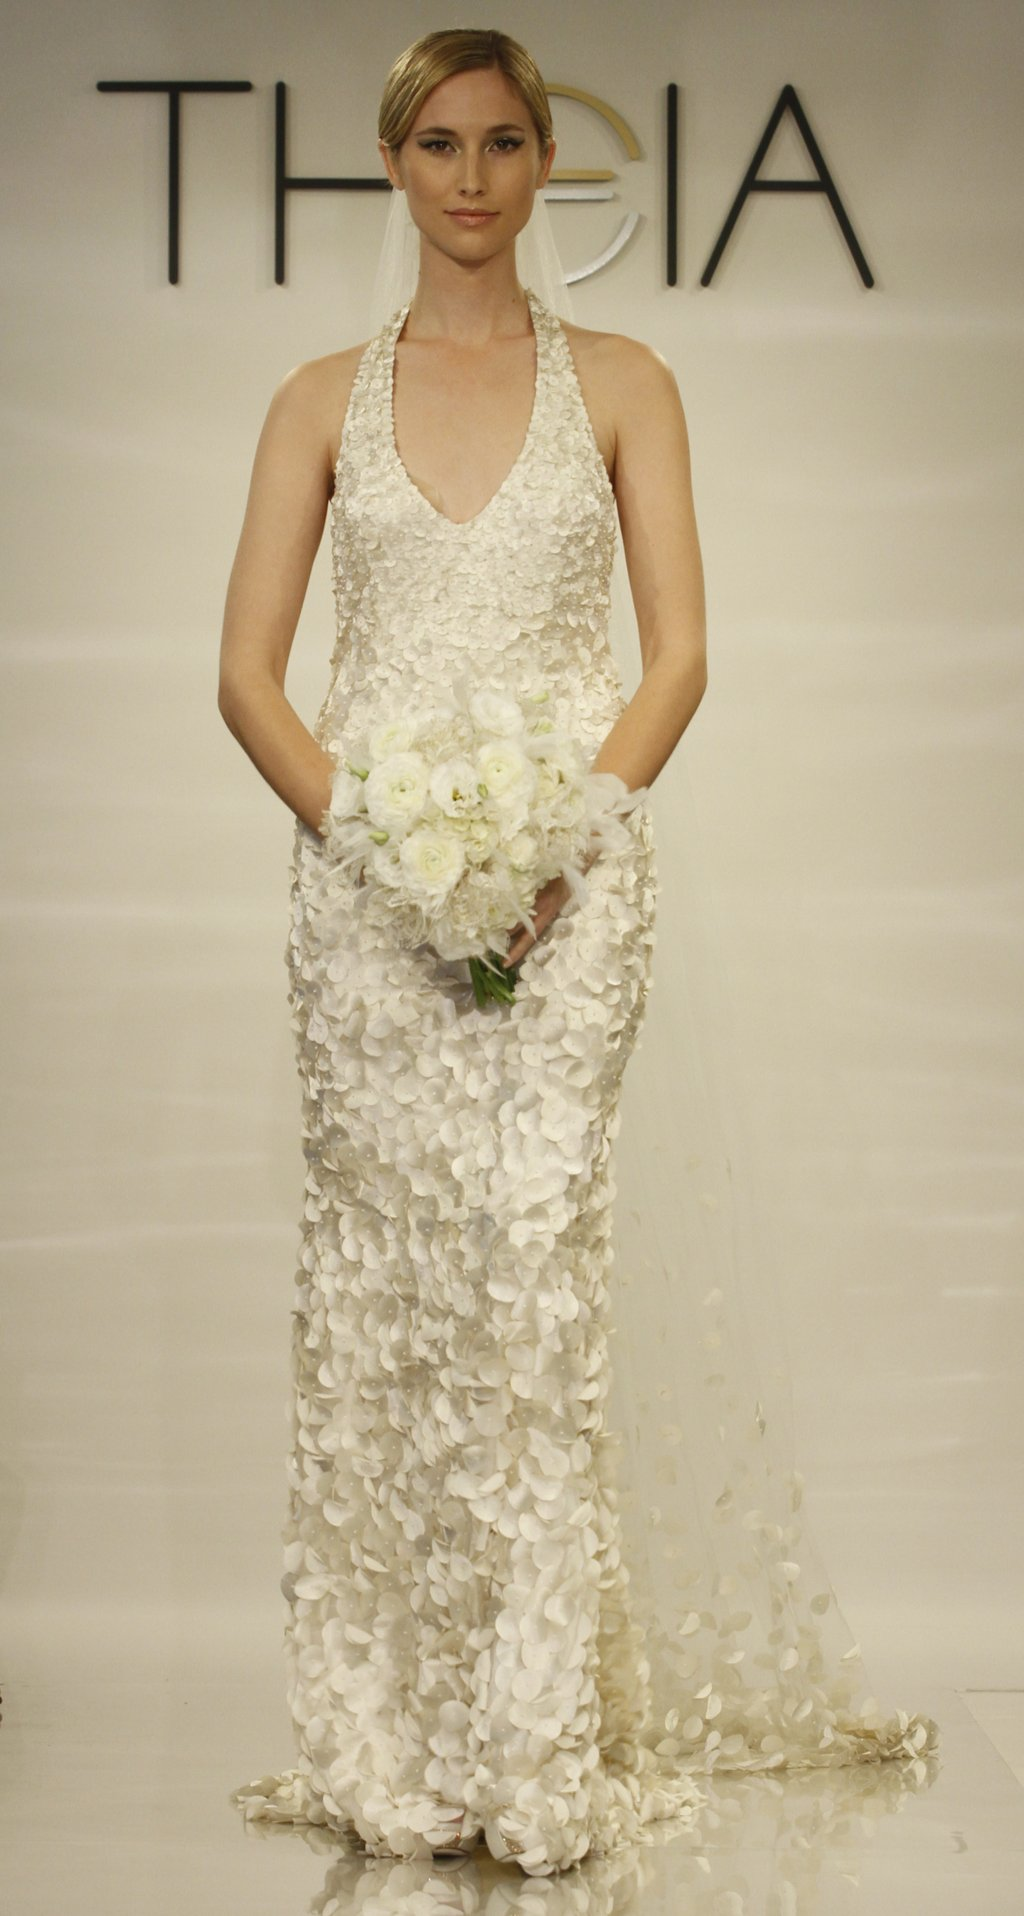 Christie-wedding-dress-by-theia-fall-2014-bridal.full